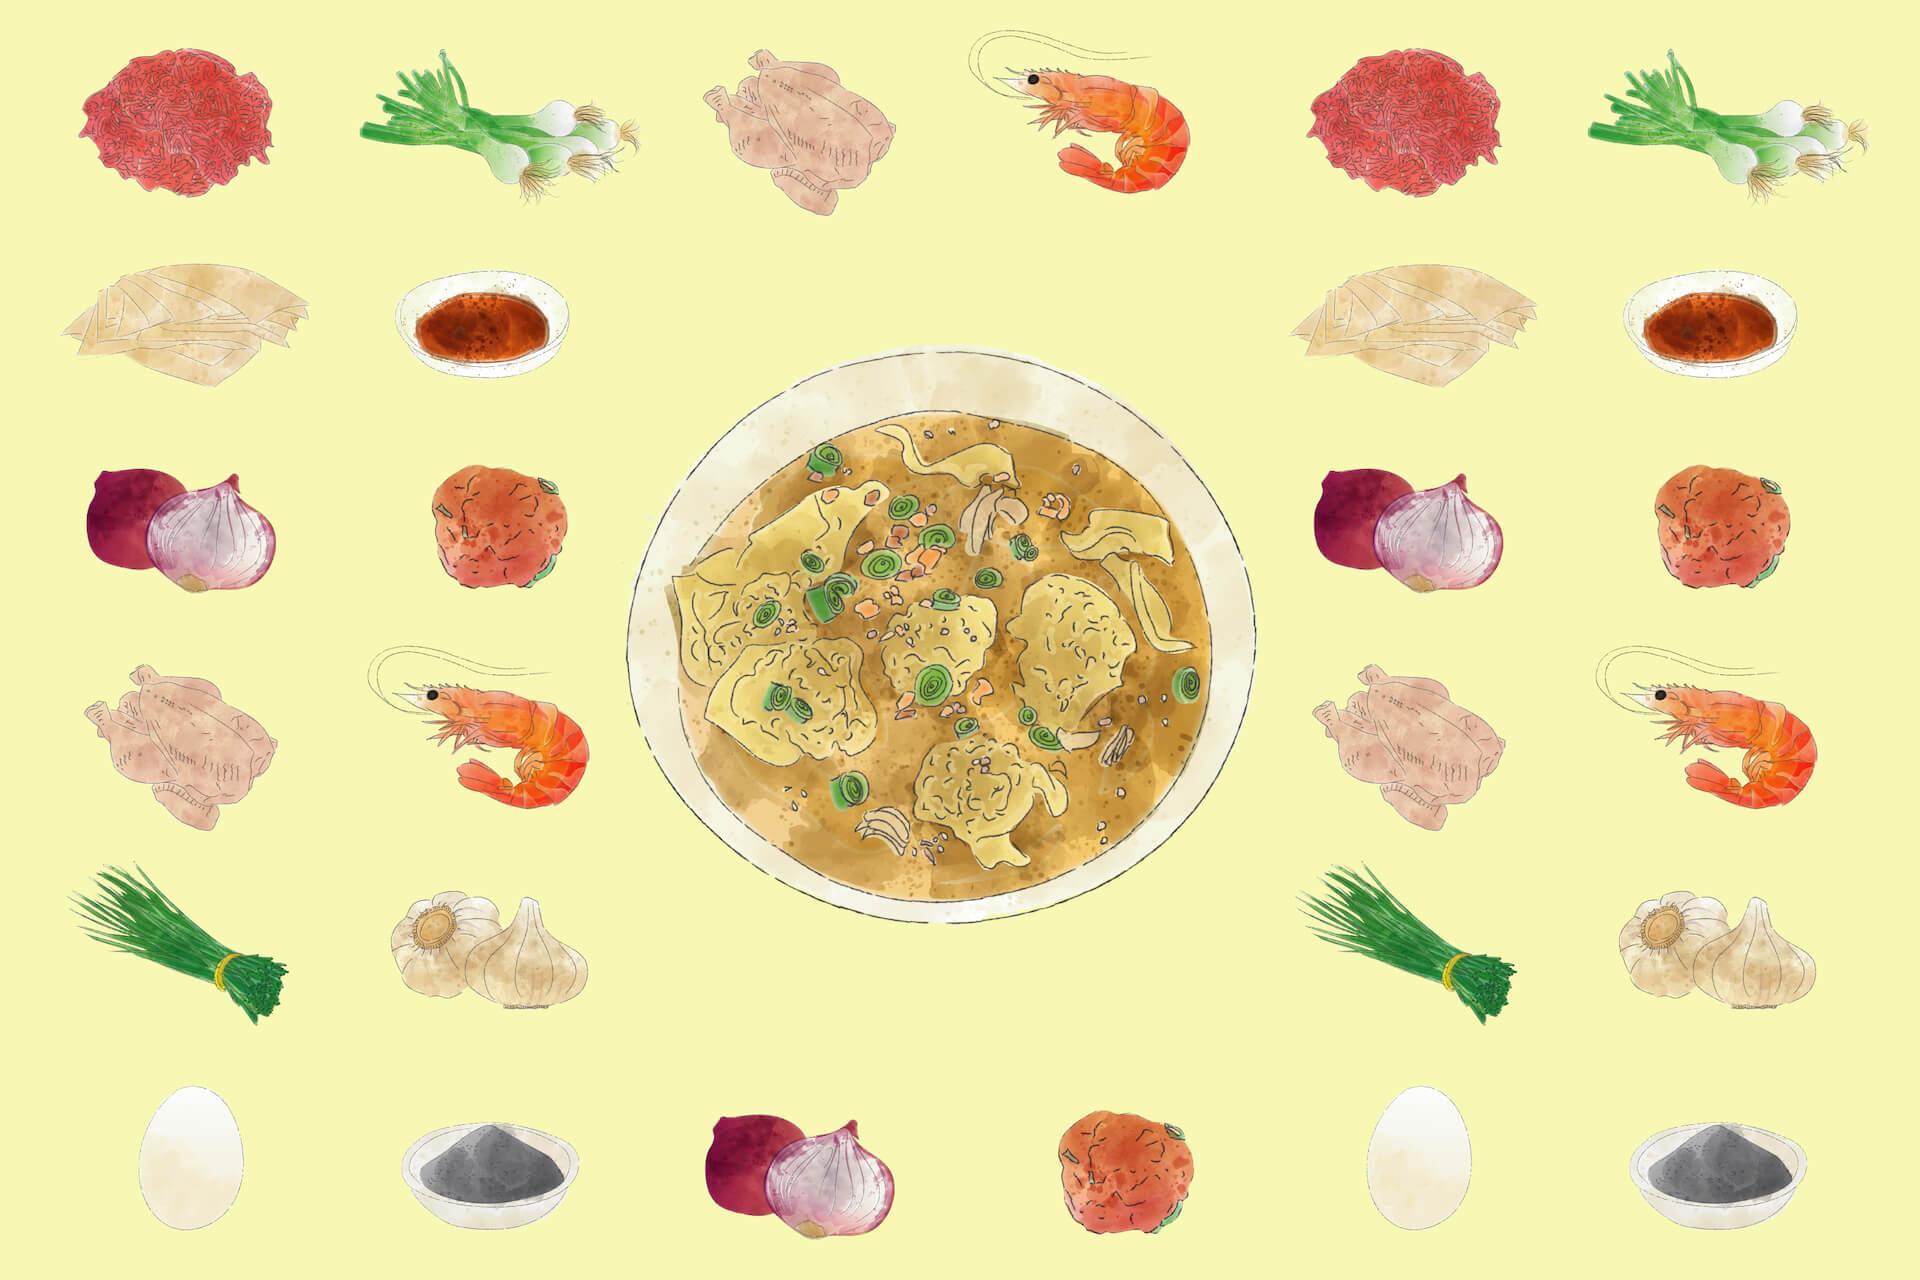 Molo soup ingredients, illustration by Isabel Ferrer